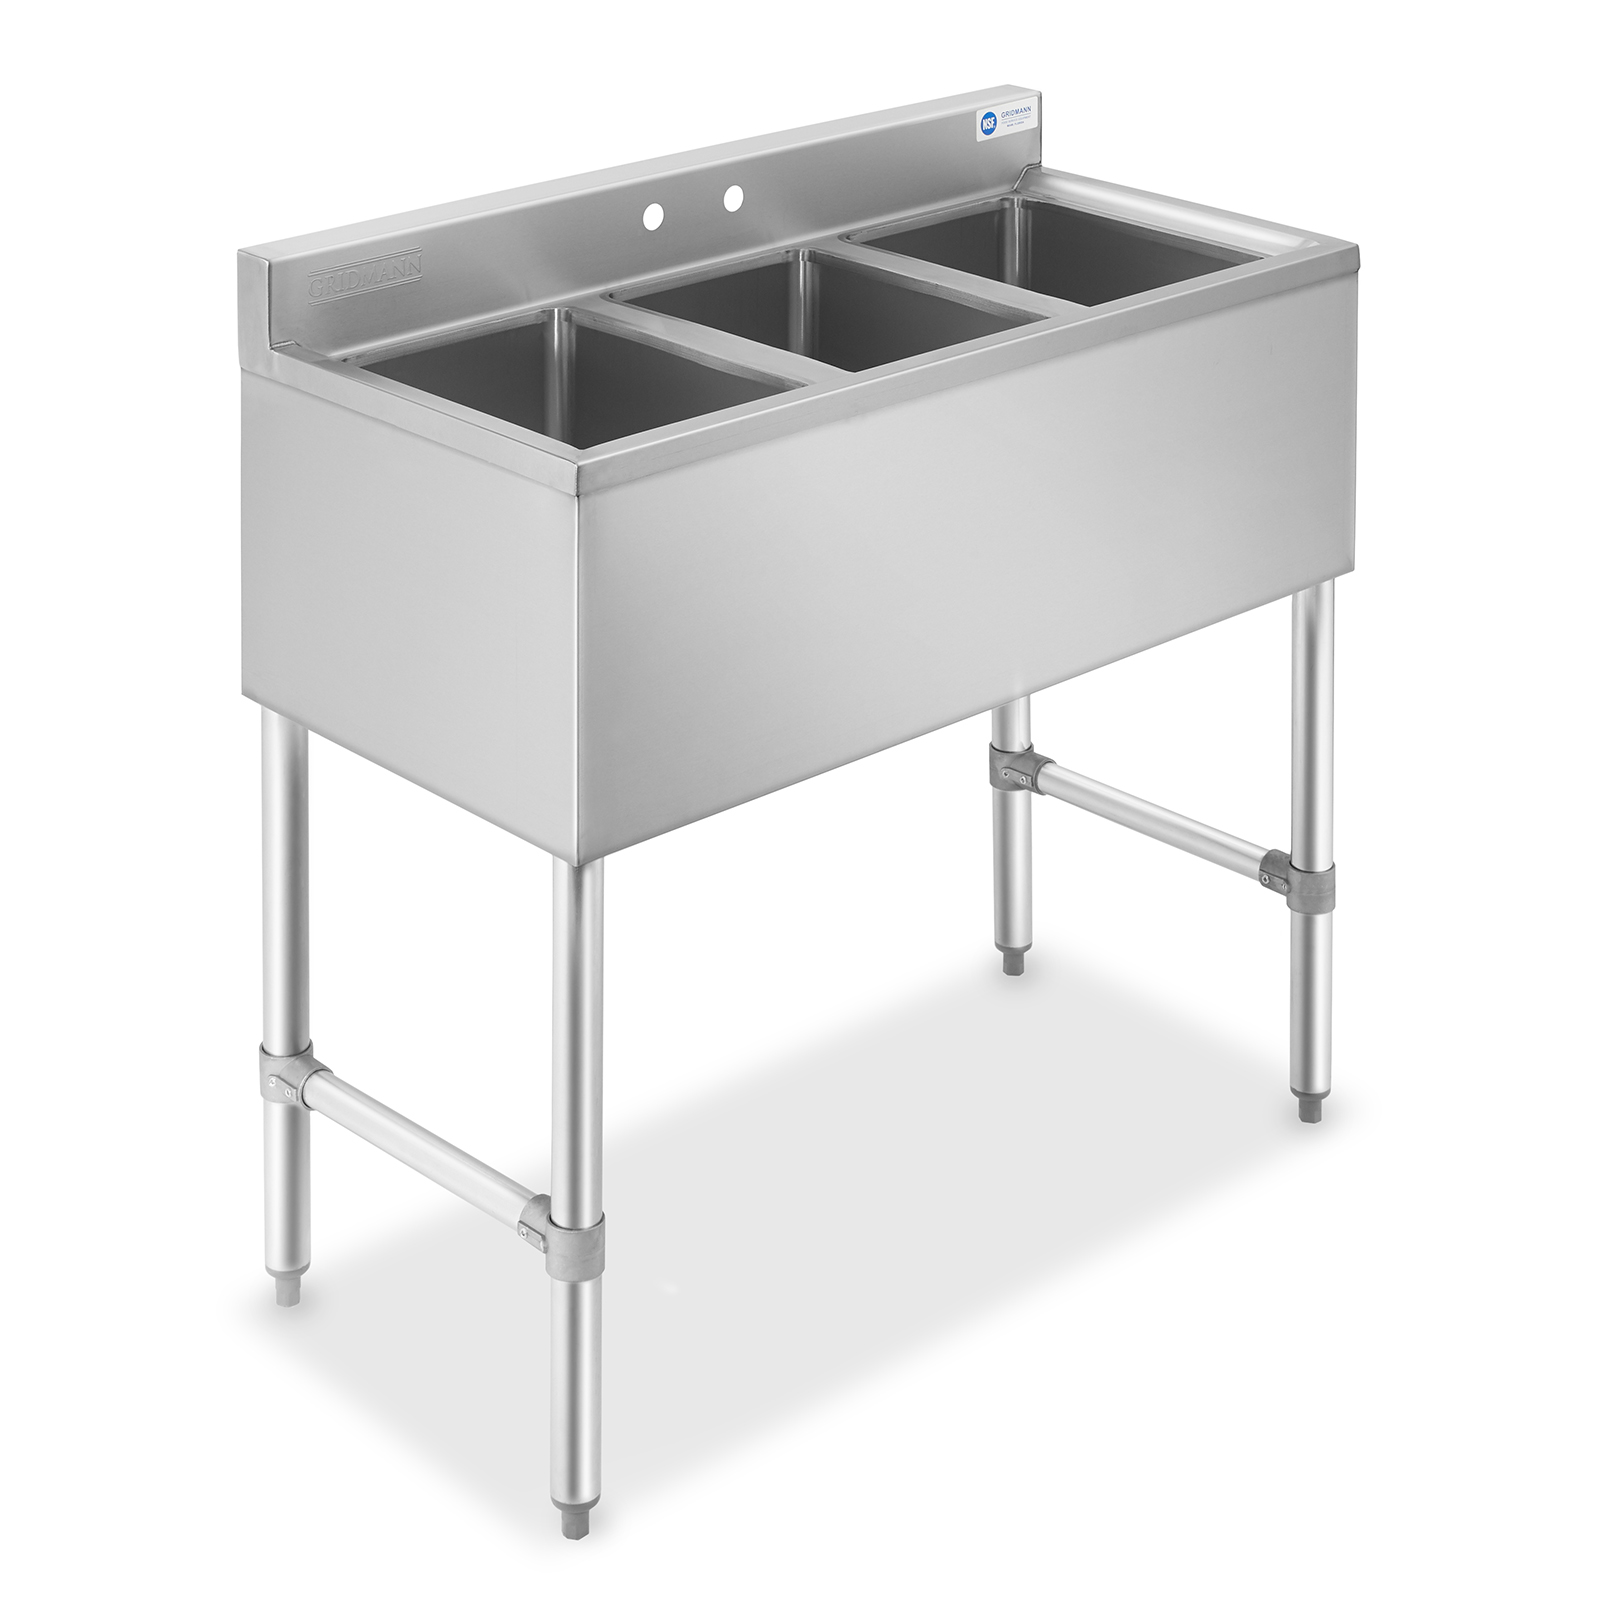 gridmann 3 compartment nsf stainless steel commercial bar sink walmart com